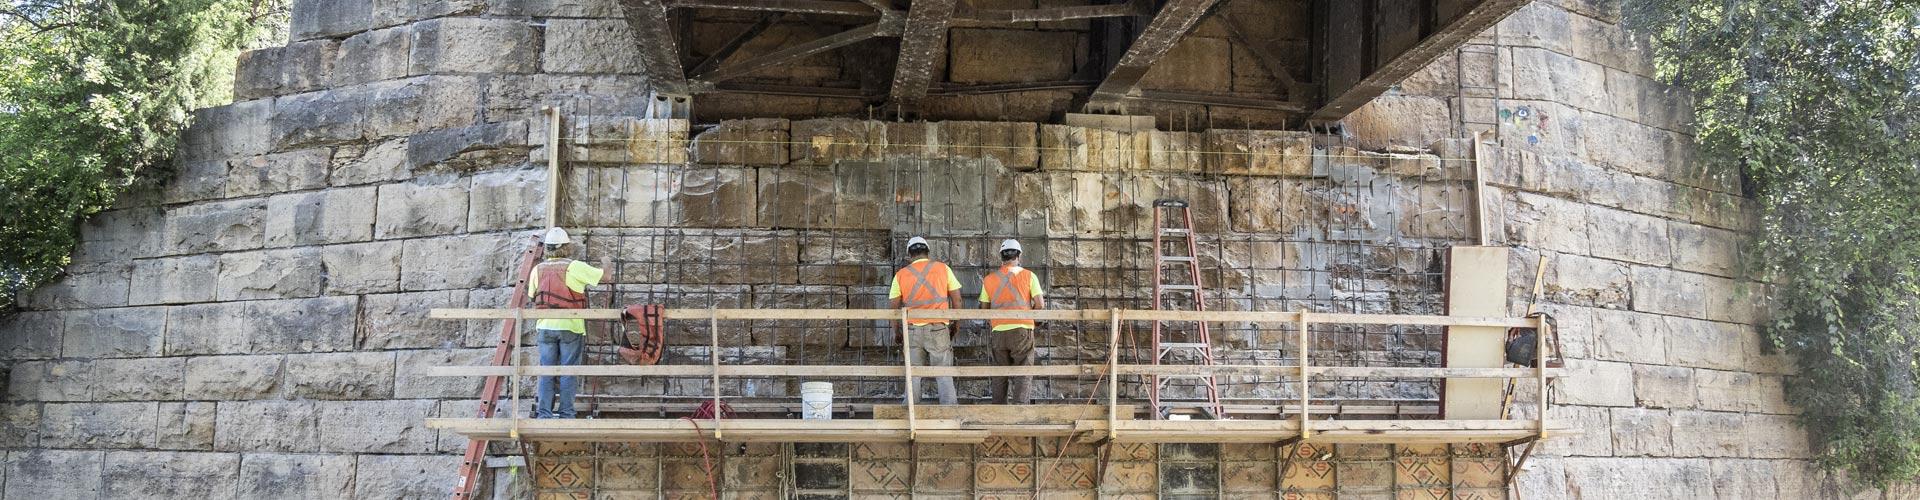 pier repairs, railroad bridge pier repairs, masonry pier repairs, bridge repairs